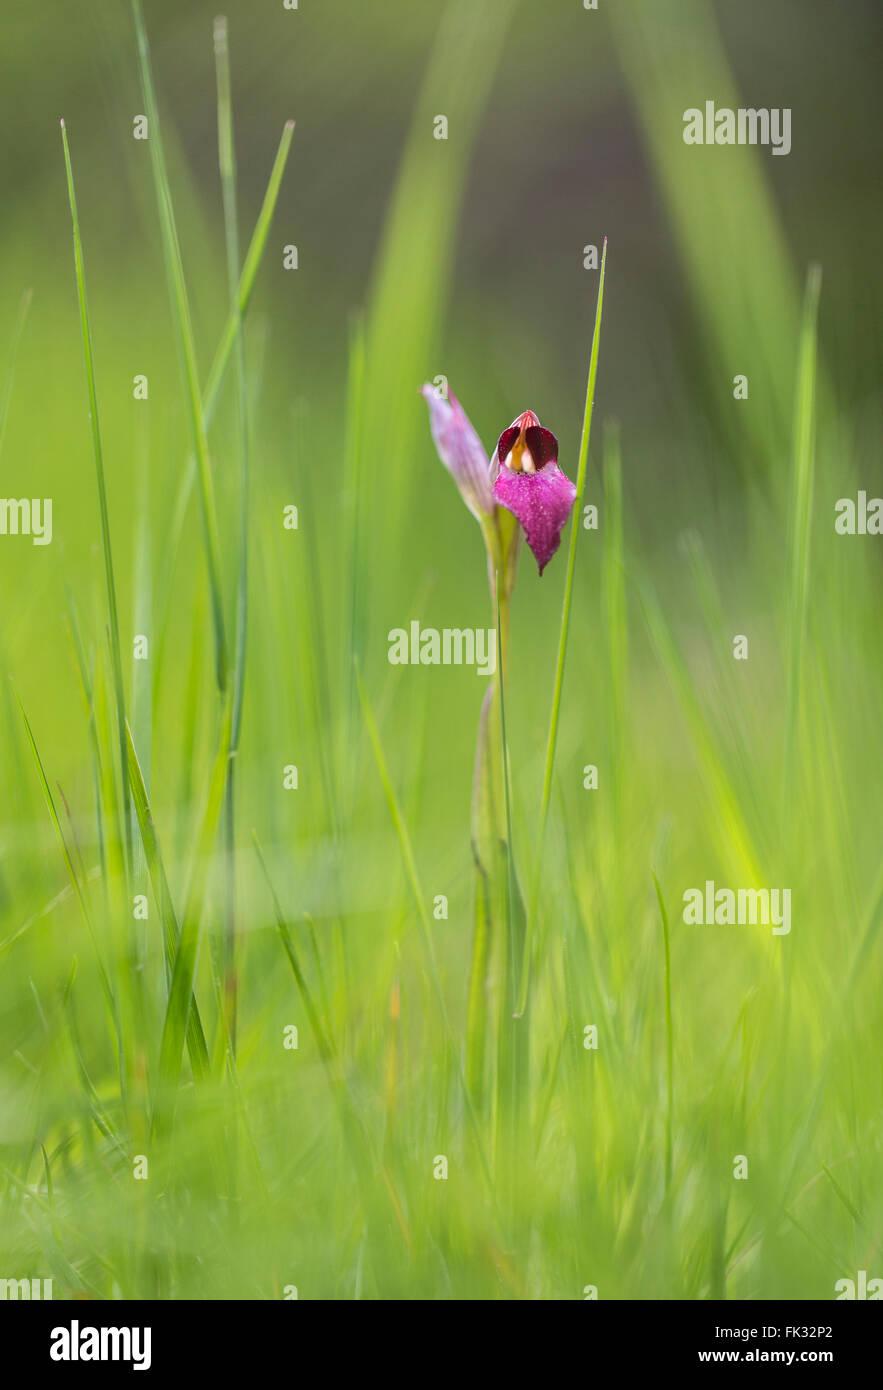 Tongue Orchid (Serapias lingua) in the grass, Trasimeno lake, Apennine Mountains, Umbria, Italy - Stock Image